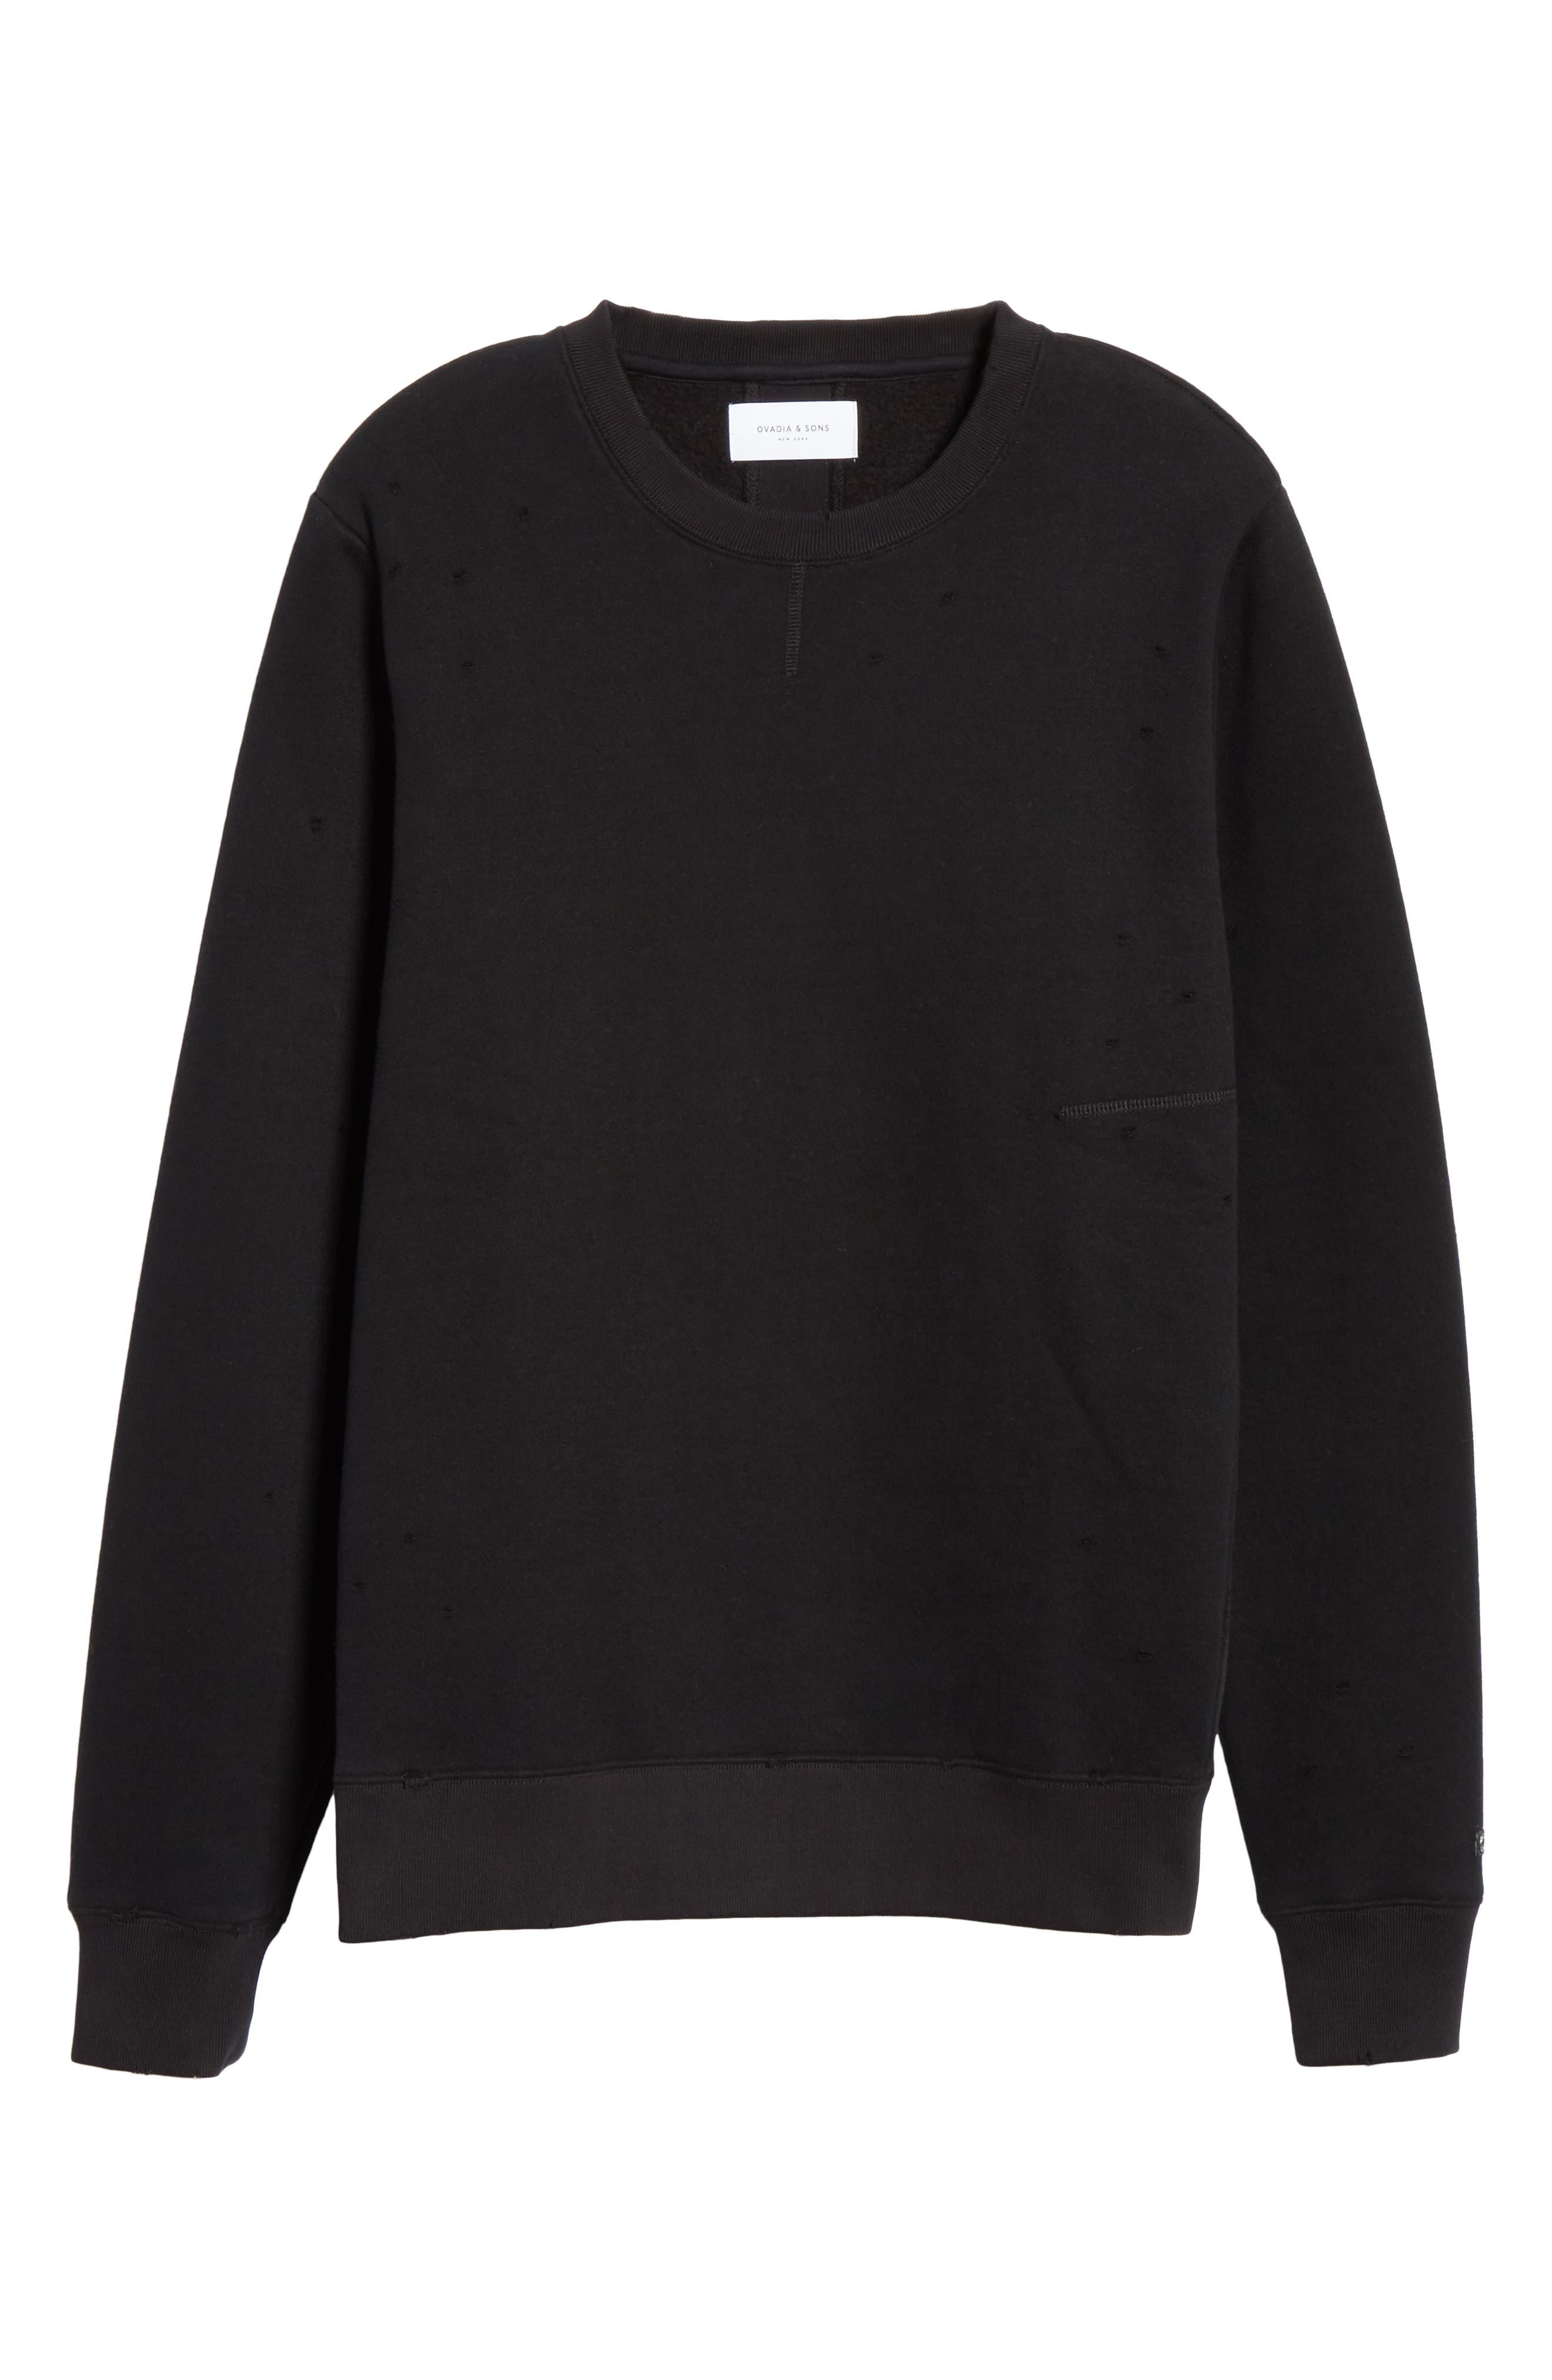 Distressed Crewneck Sweatshirt,                             Alternate thumbnail 6, color,                             BLACK